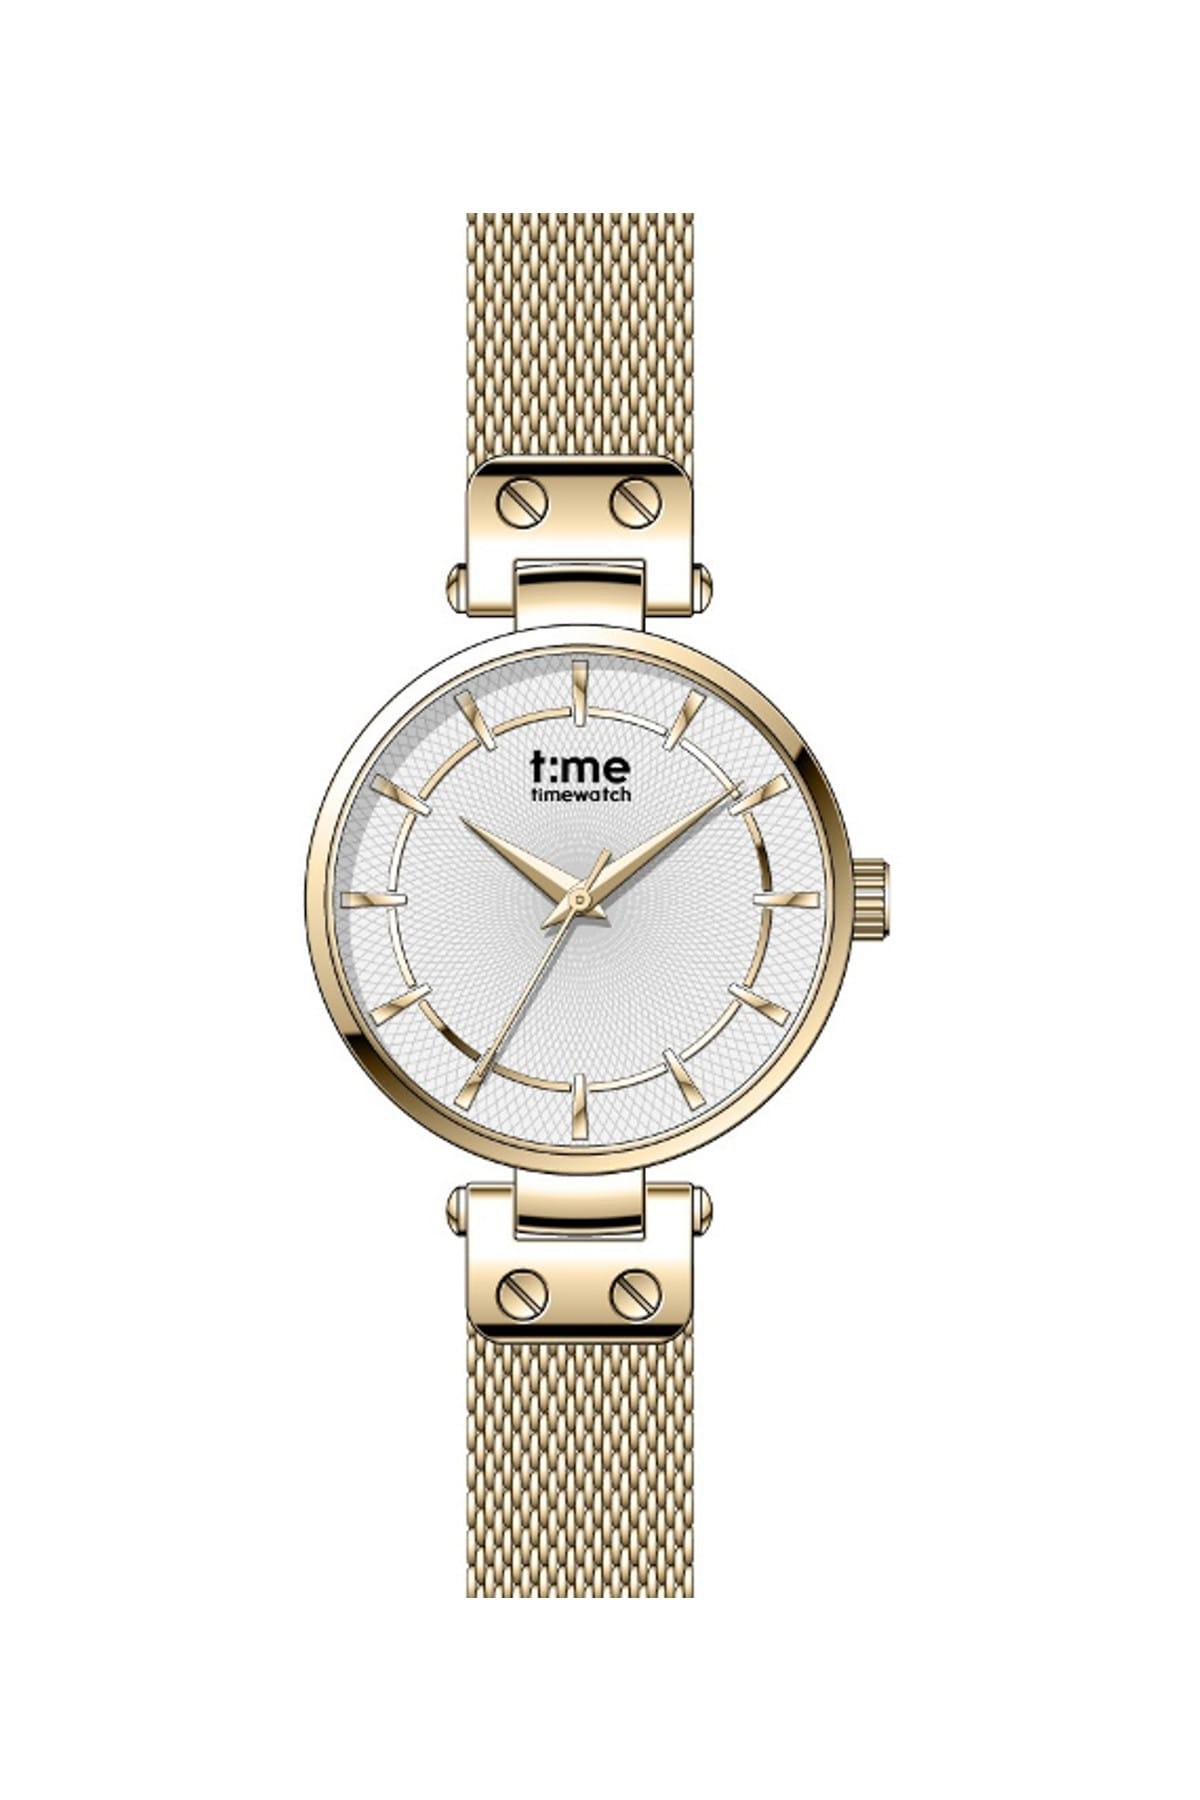 Timewatch Kadın Kol Saati TW.133.4GSG 1